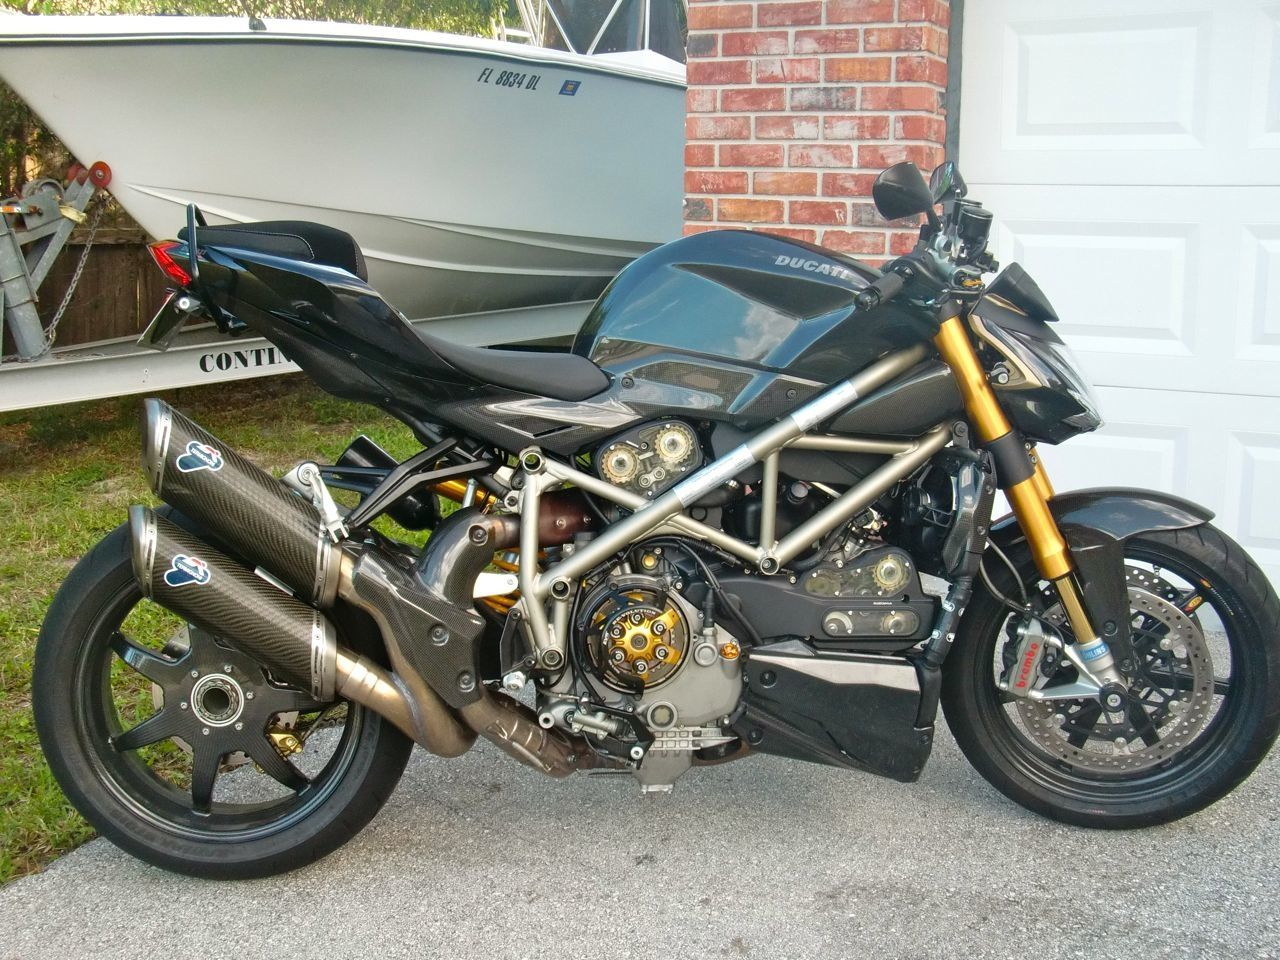 Ducati Streetfighter 1198R